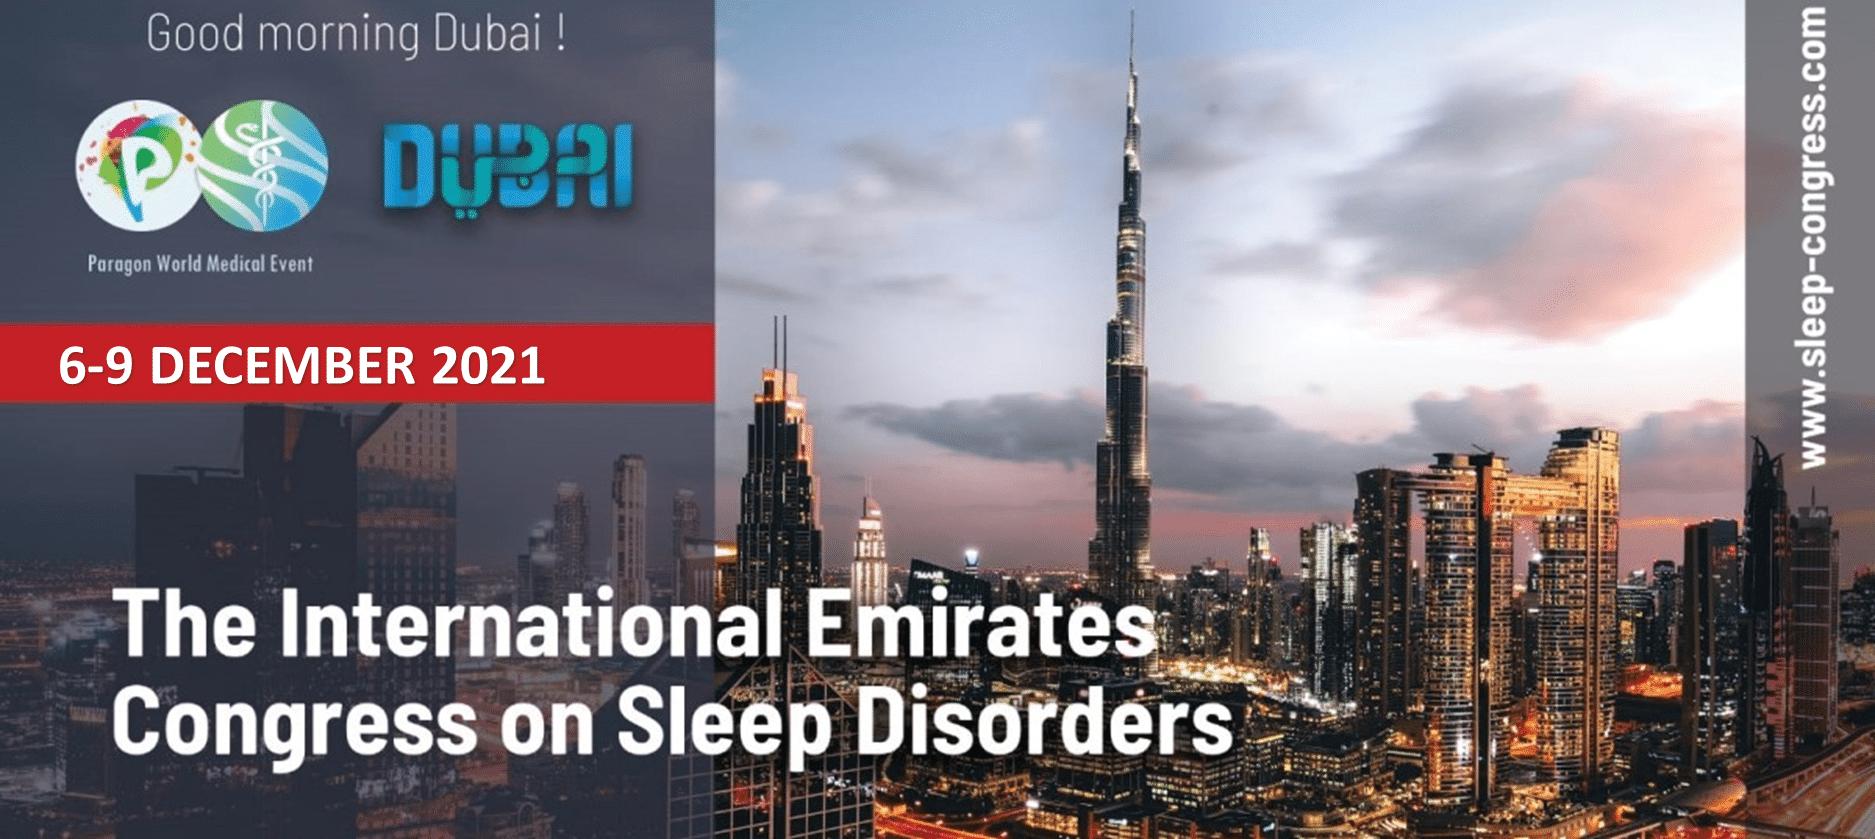 The Sleep Congress 2021